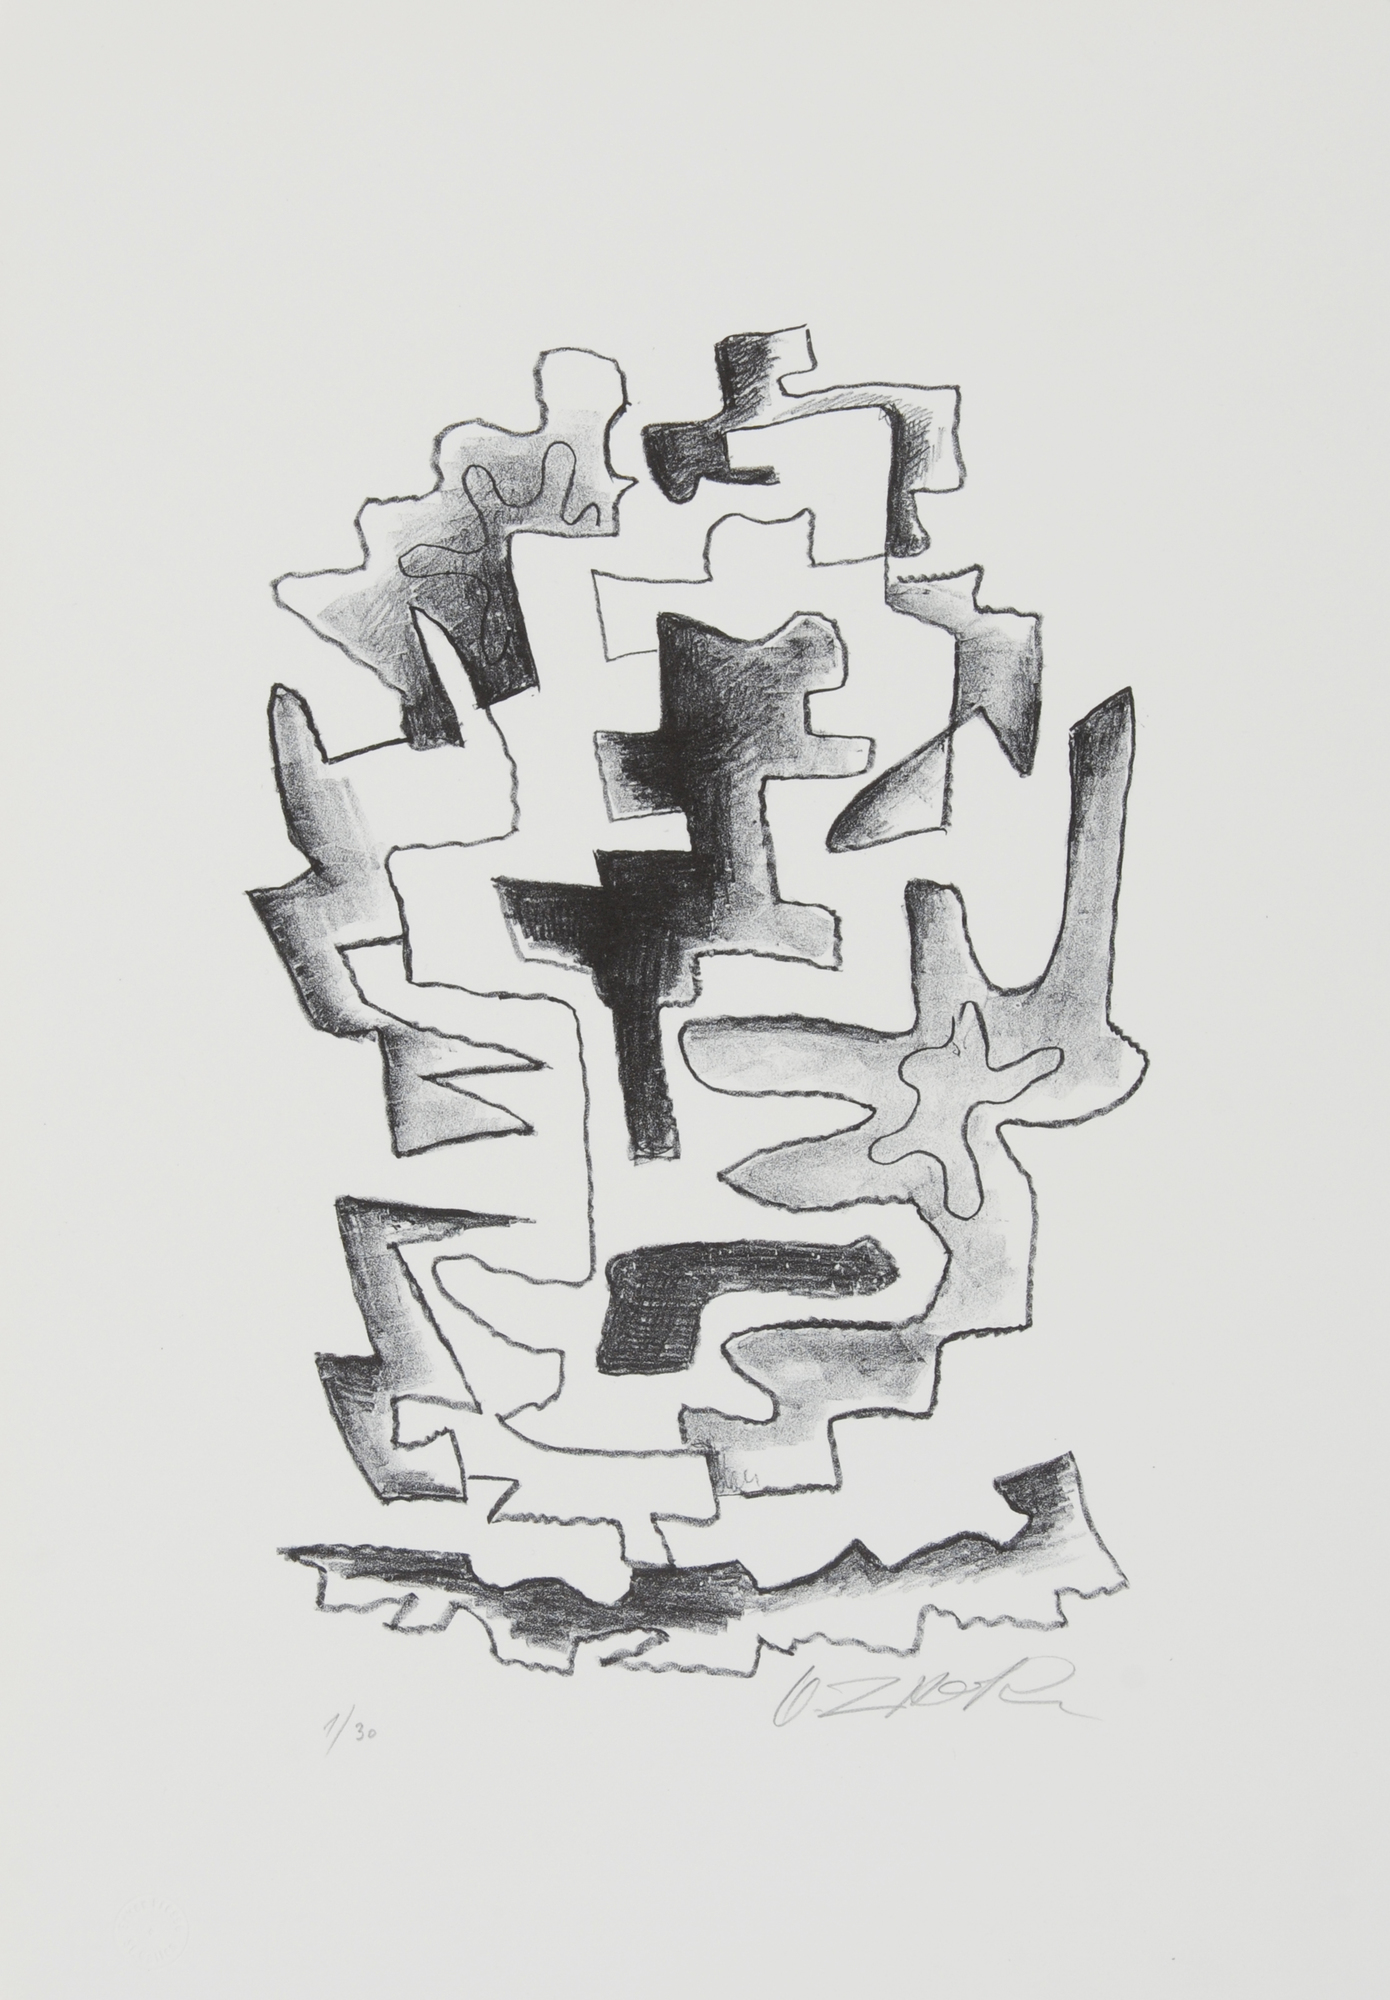 Zadkine Ossip, 2 sheets: L'inspire, 1961; Le noir souriant